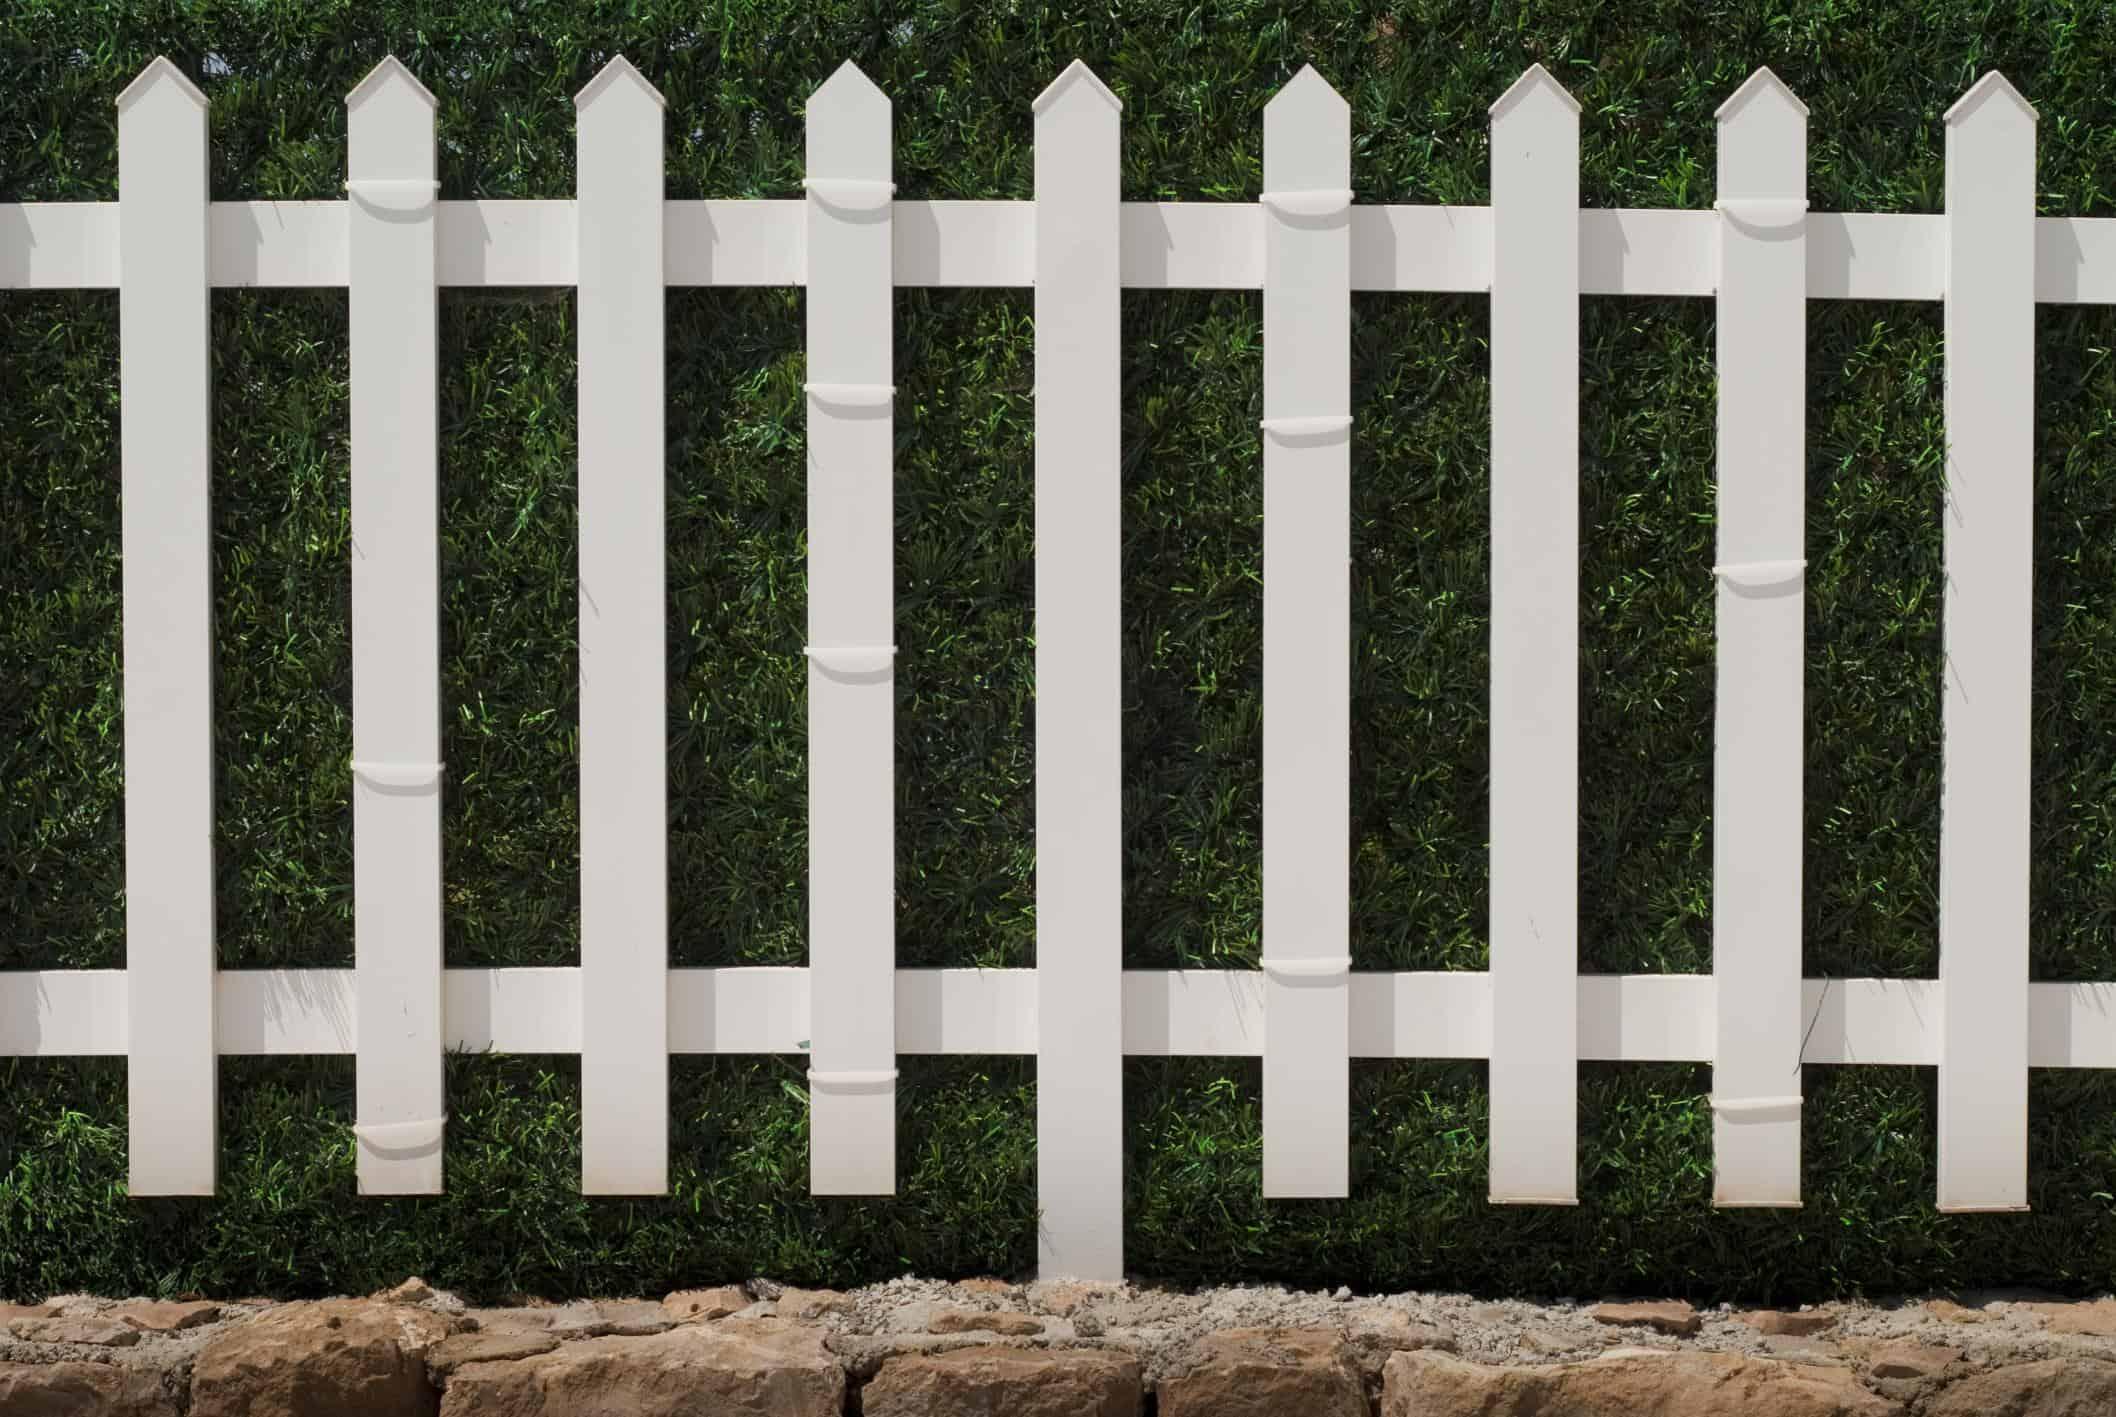 Concord CA Fence Company - Vinyl Fencing and Gates